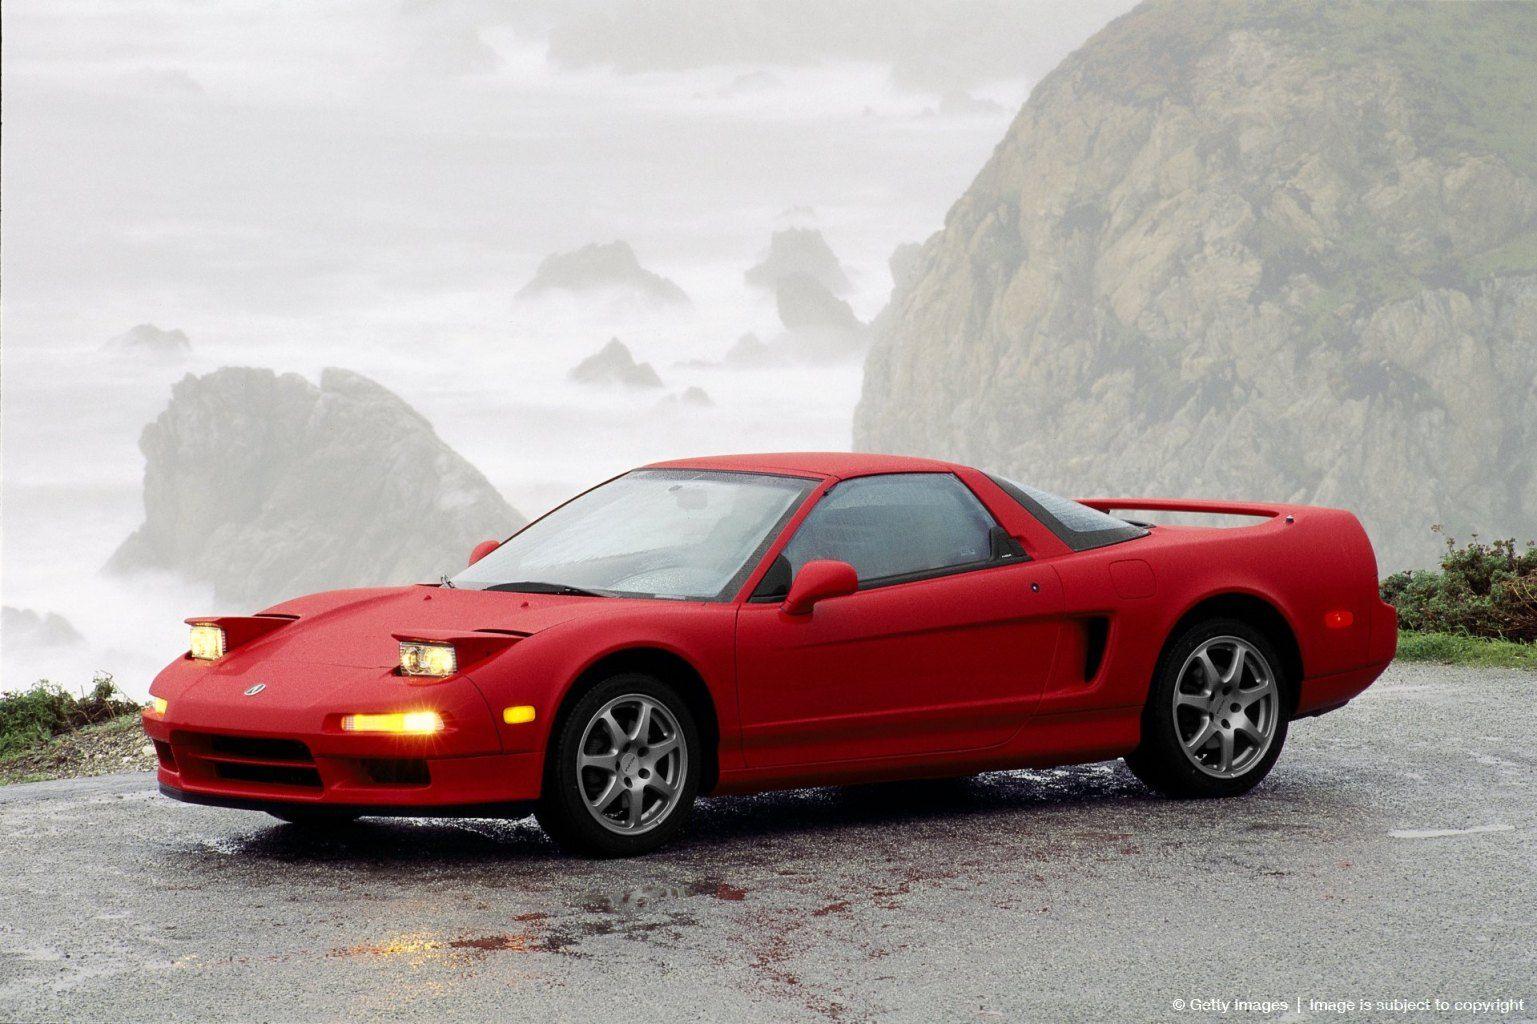 1990 Red Acura NSX Cars Honda sports car, Acura nsx